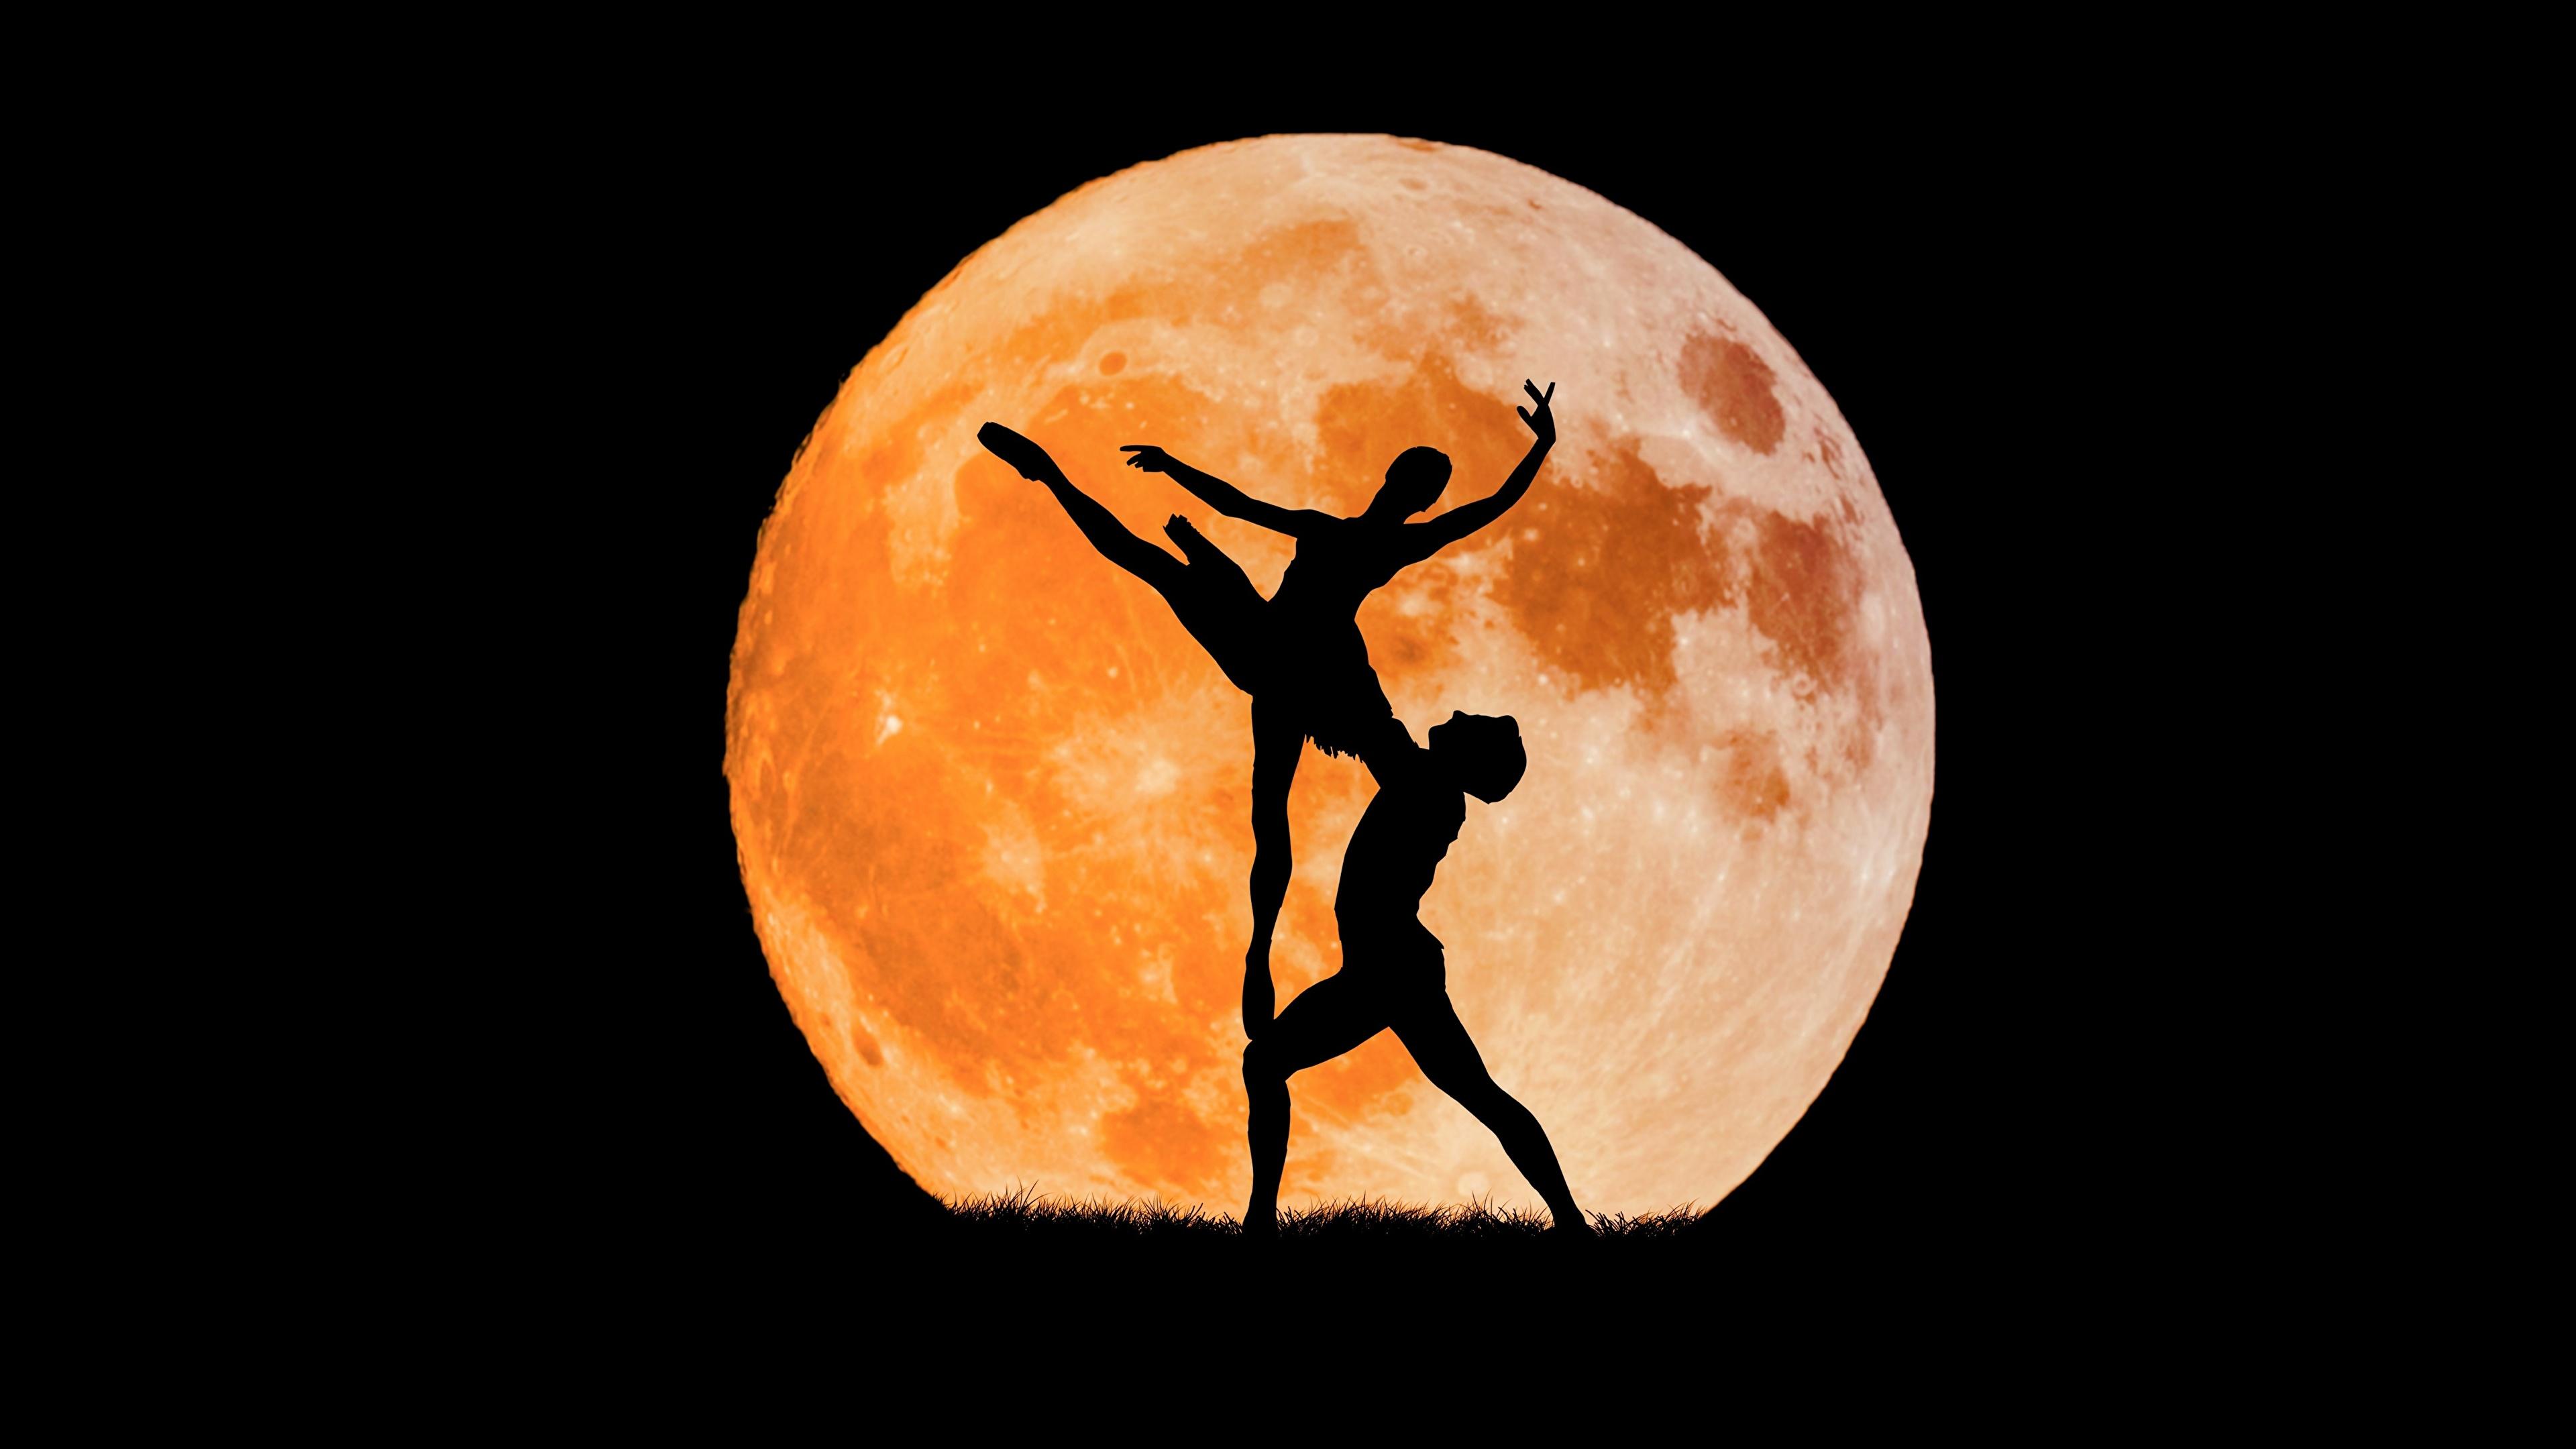 Обои для рабочего стола Балет силуэты луны 3840x2160 балете балета Силуэт силуэта Луна луной